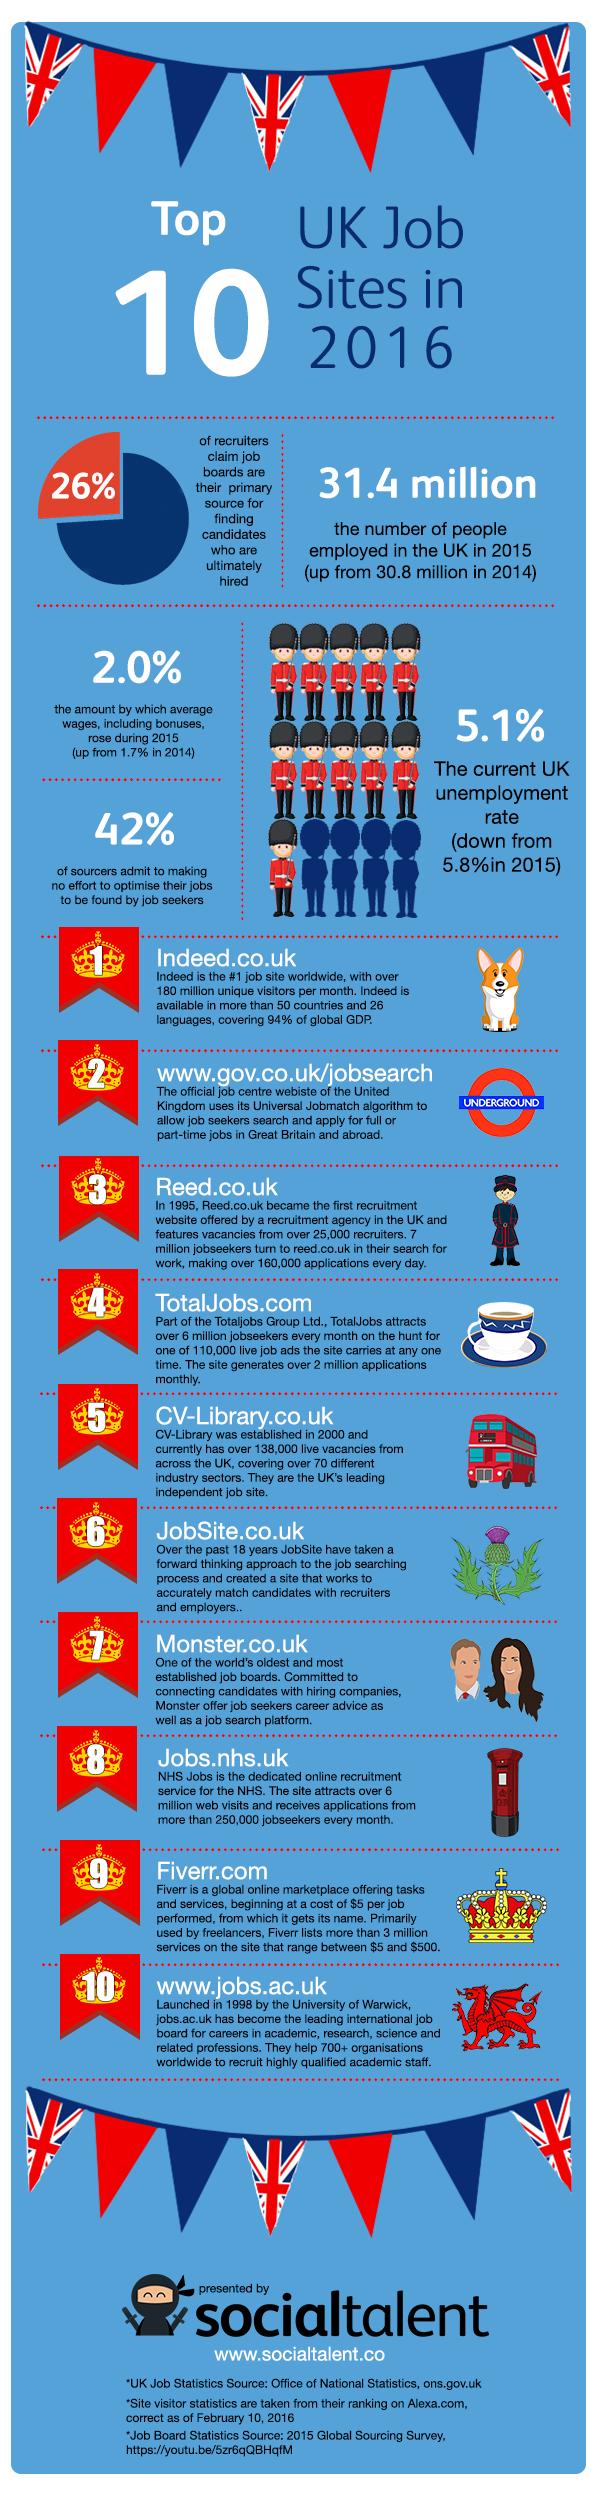 Top-10-UK-Job-Boards-2016-Infographic